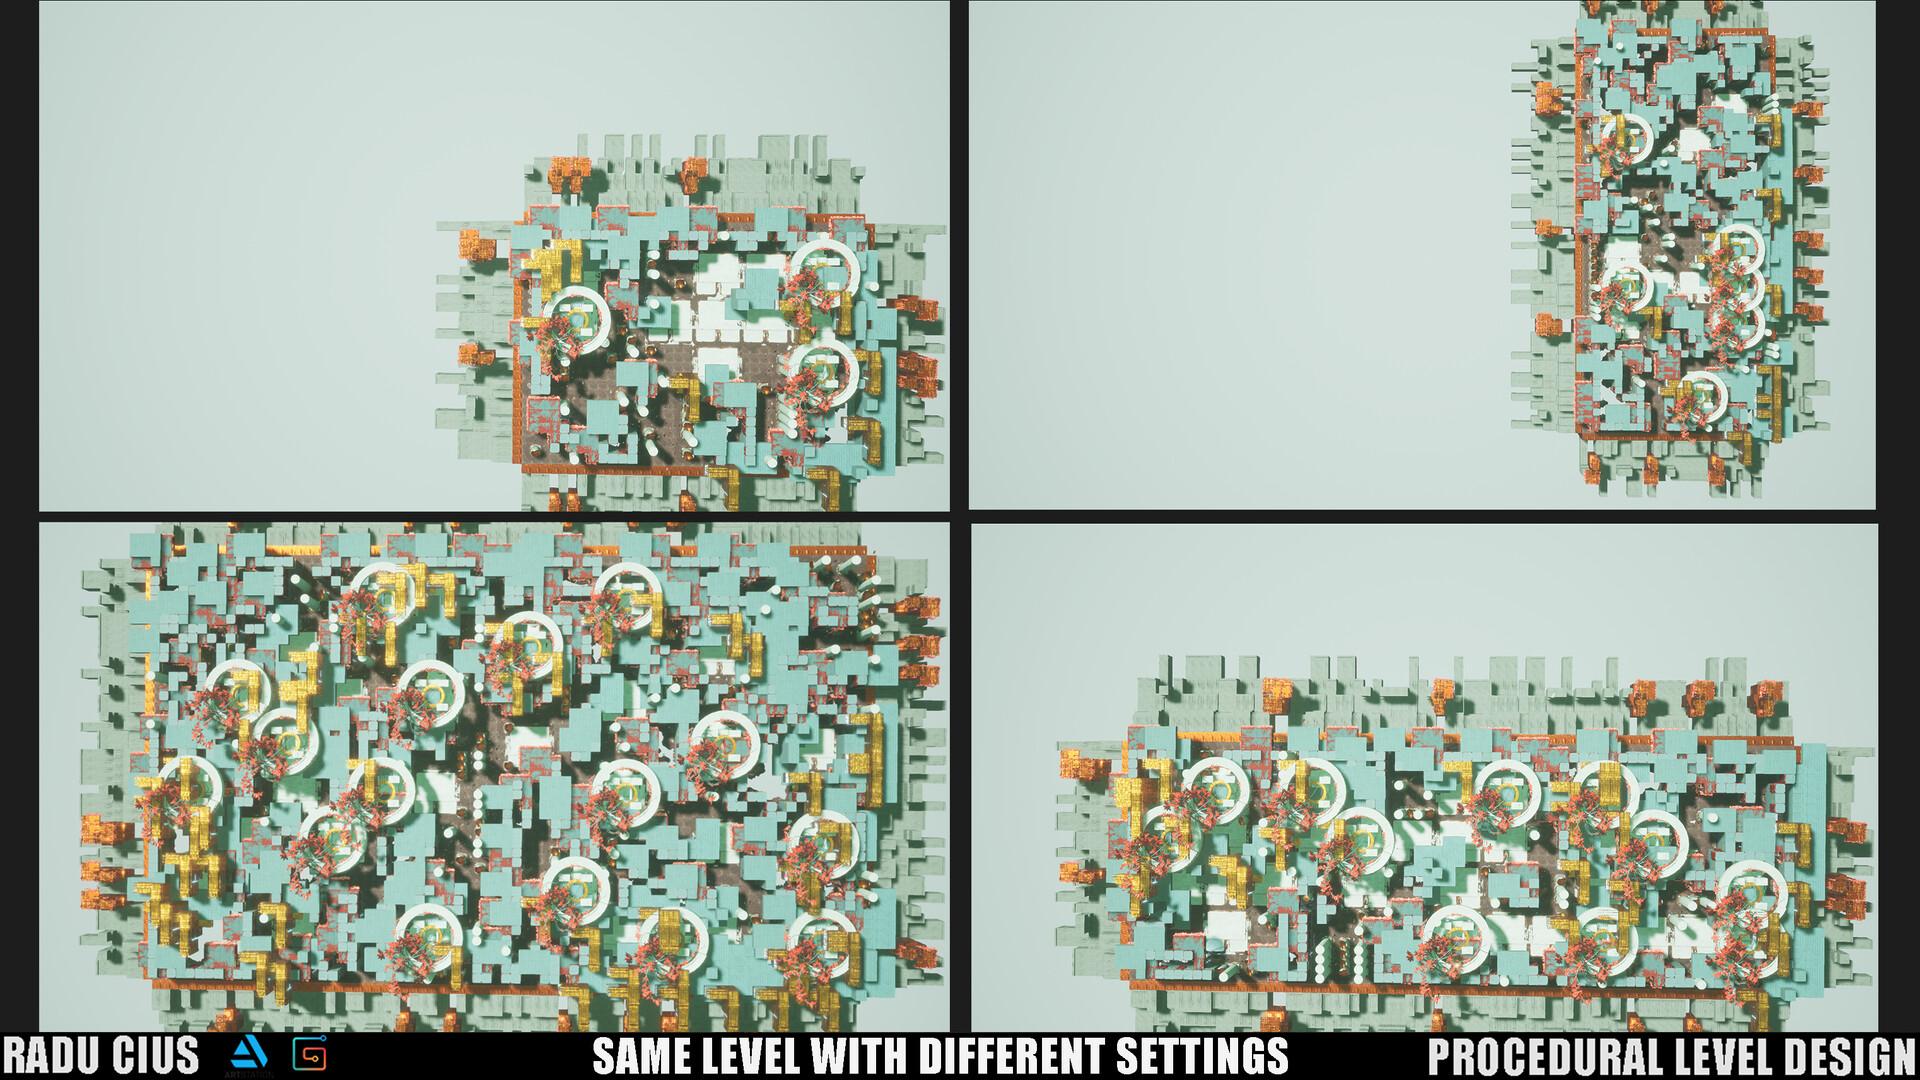 Creating Procedural Level Design